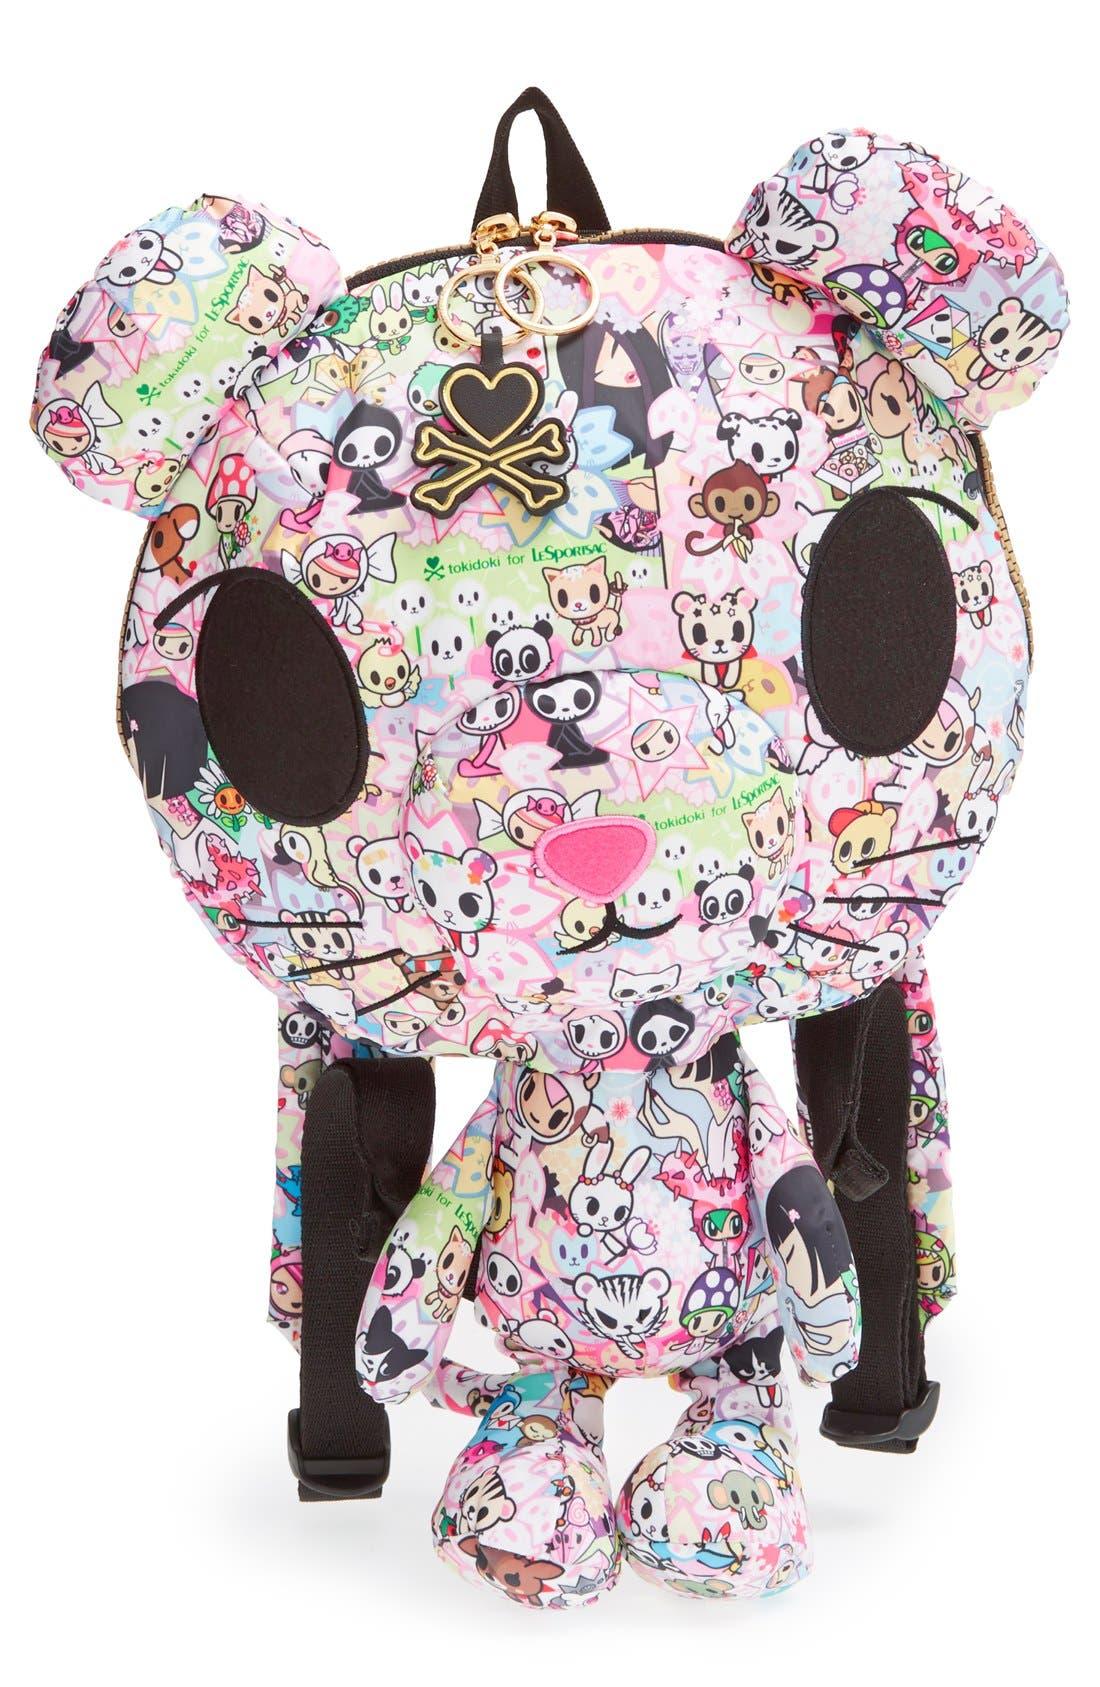 Alternate Image 1 Selected - tokidoki x LeSportsac 'Palette' Backpack